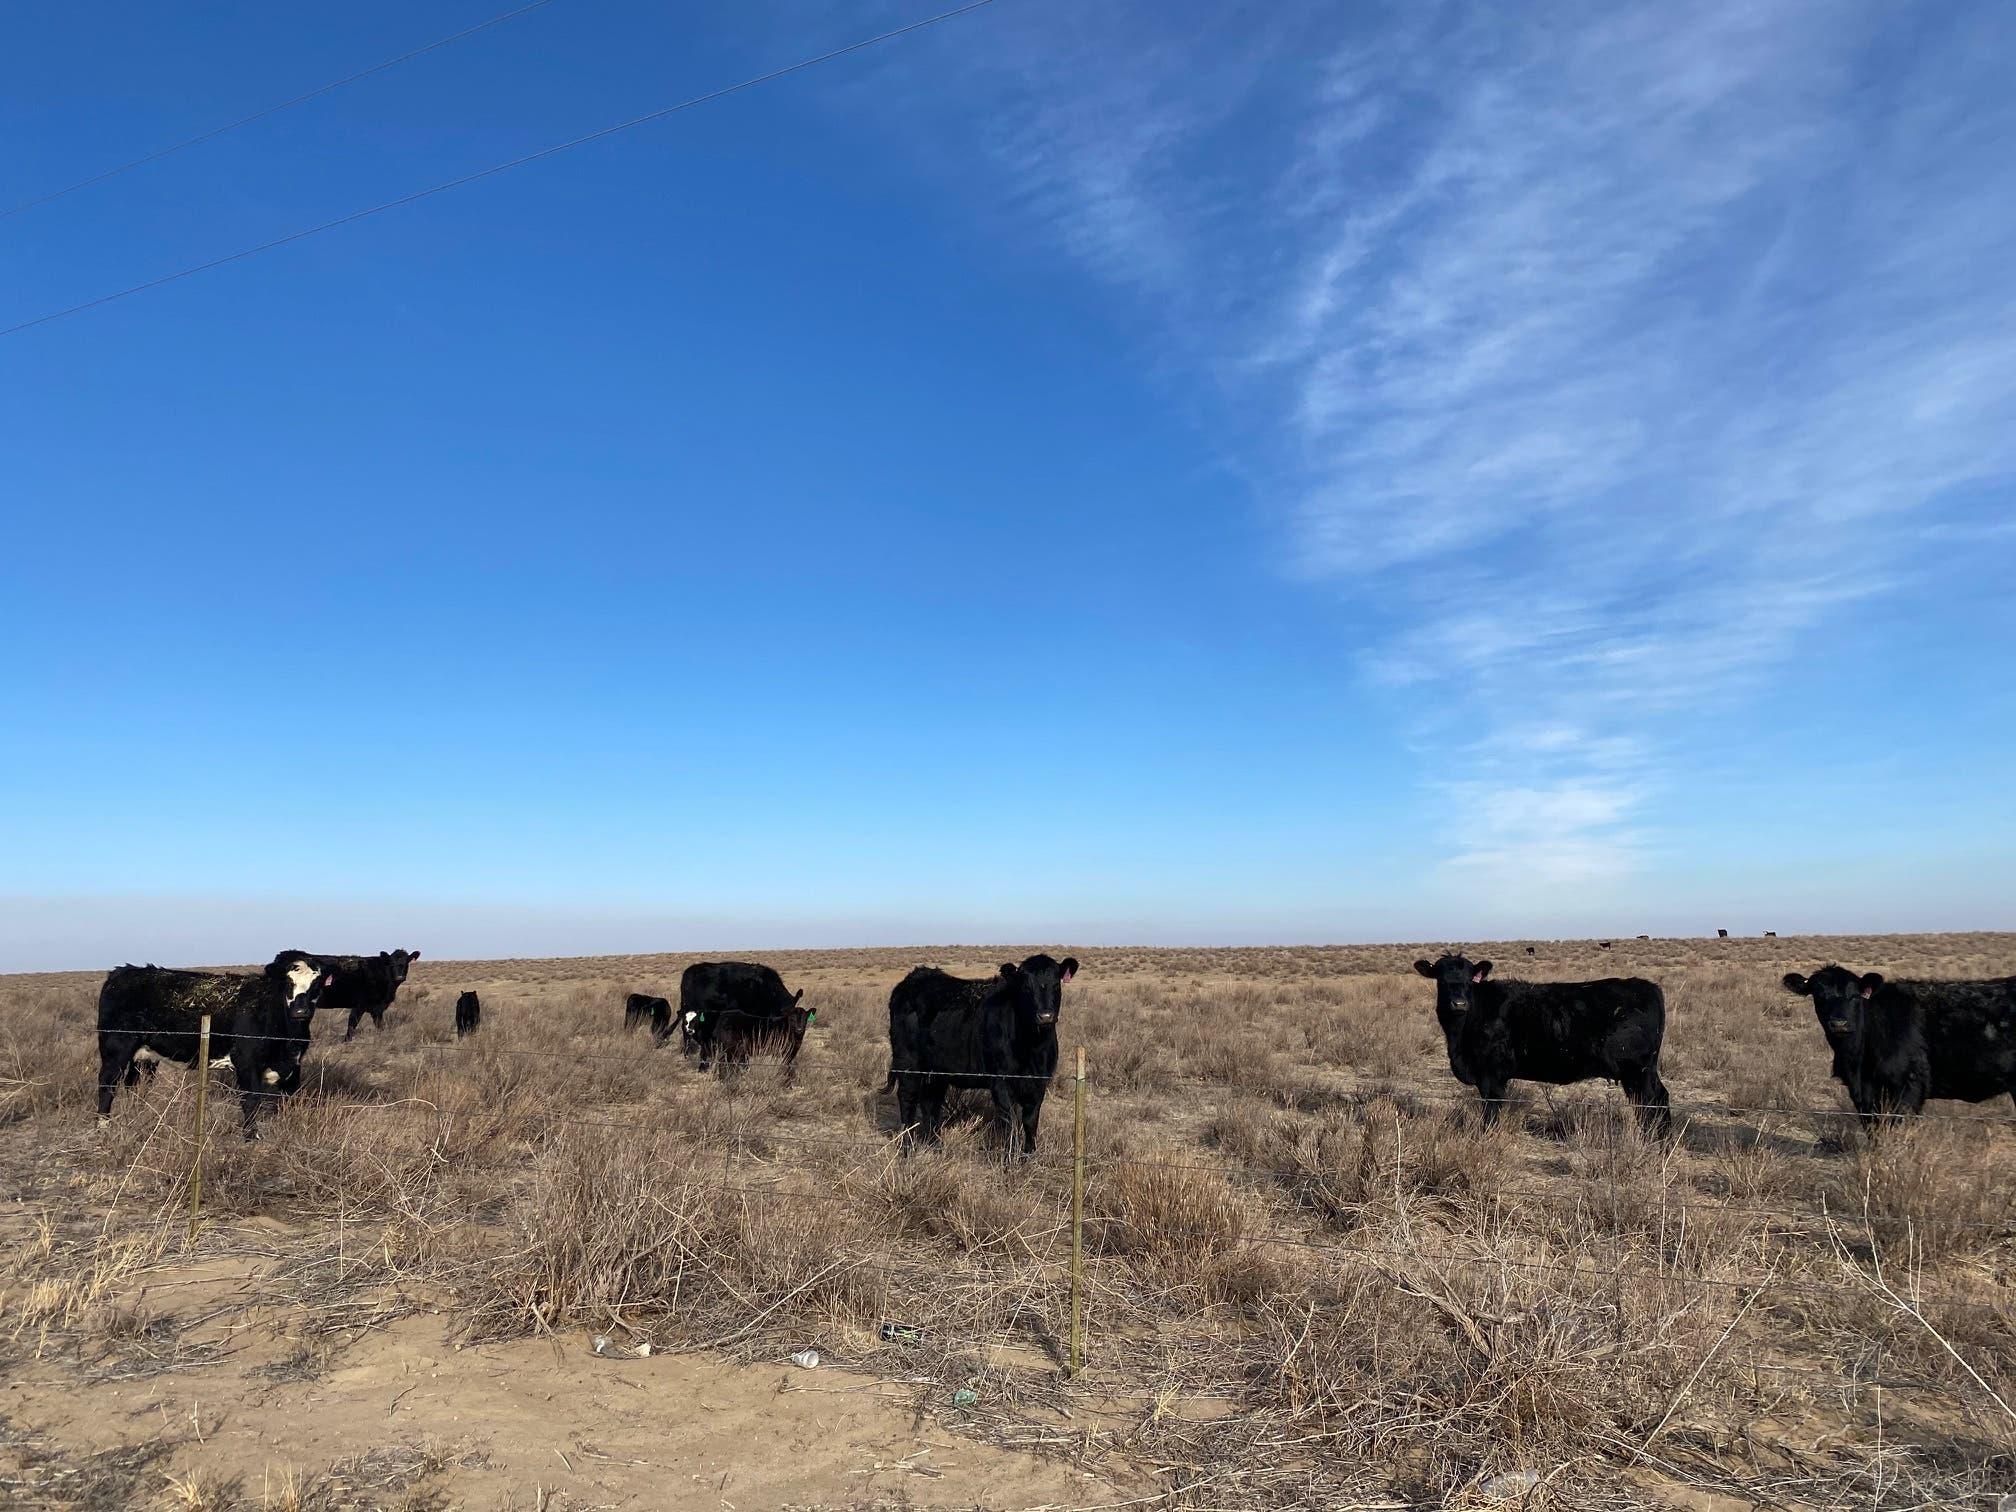 Cattle are seen on a range near U.S. 287 in Kiowa County north of Eads on Feb. 7, 2021.